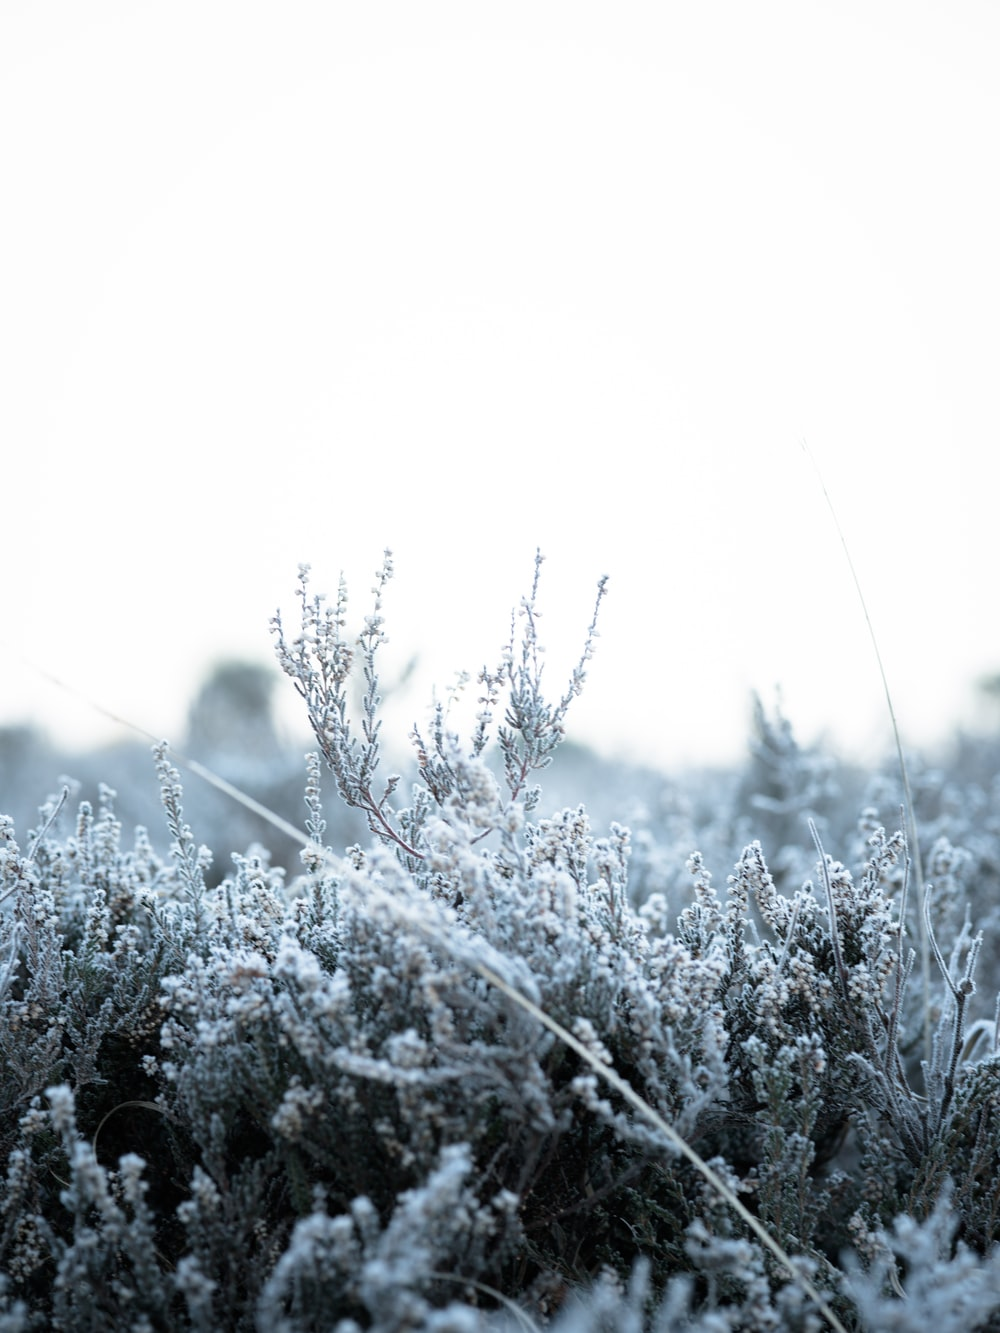 frosty bush plant scenery